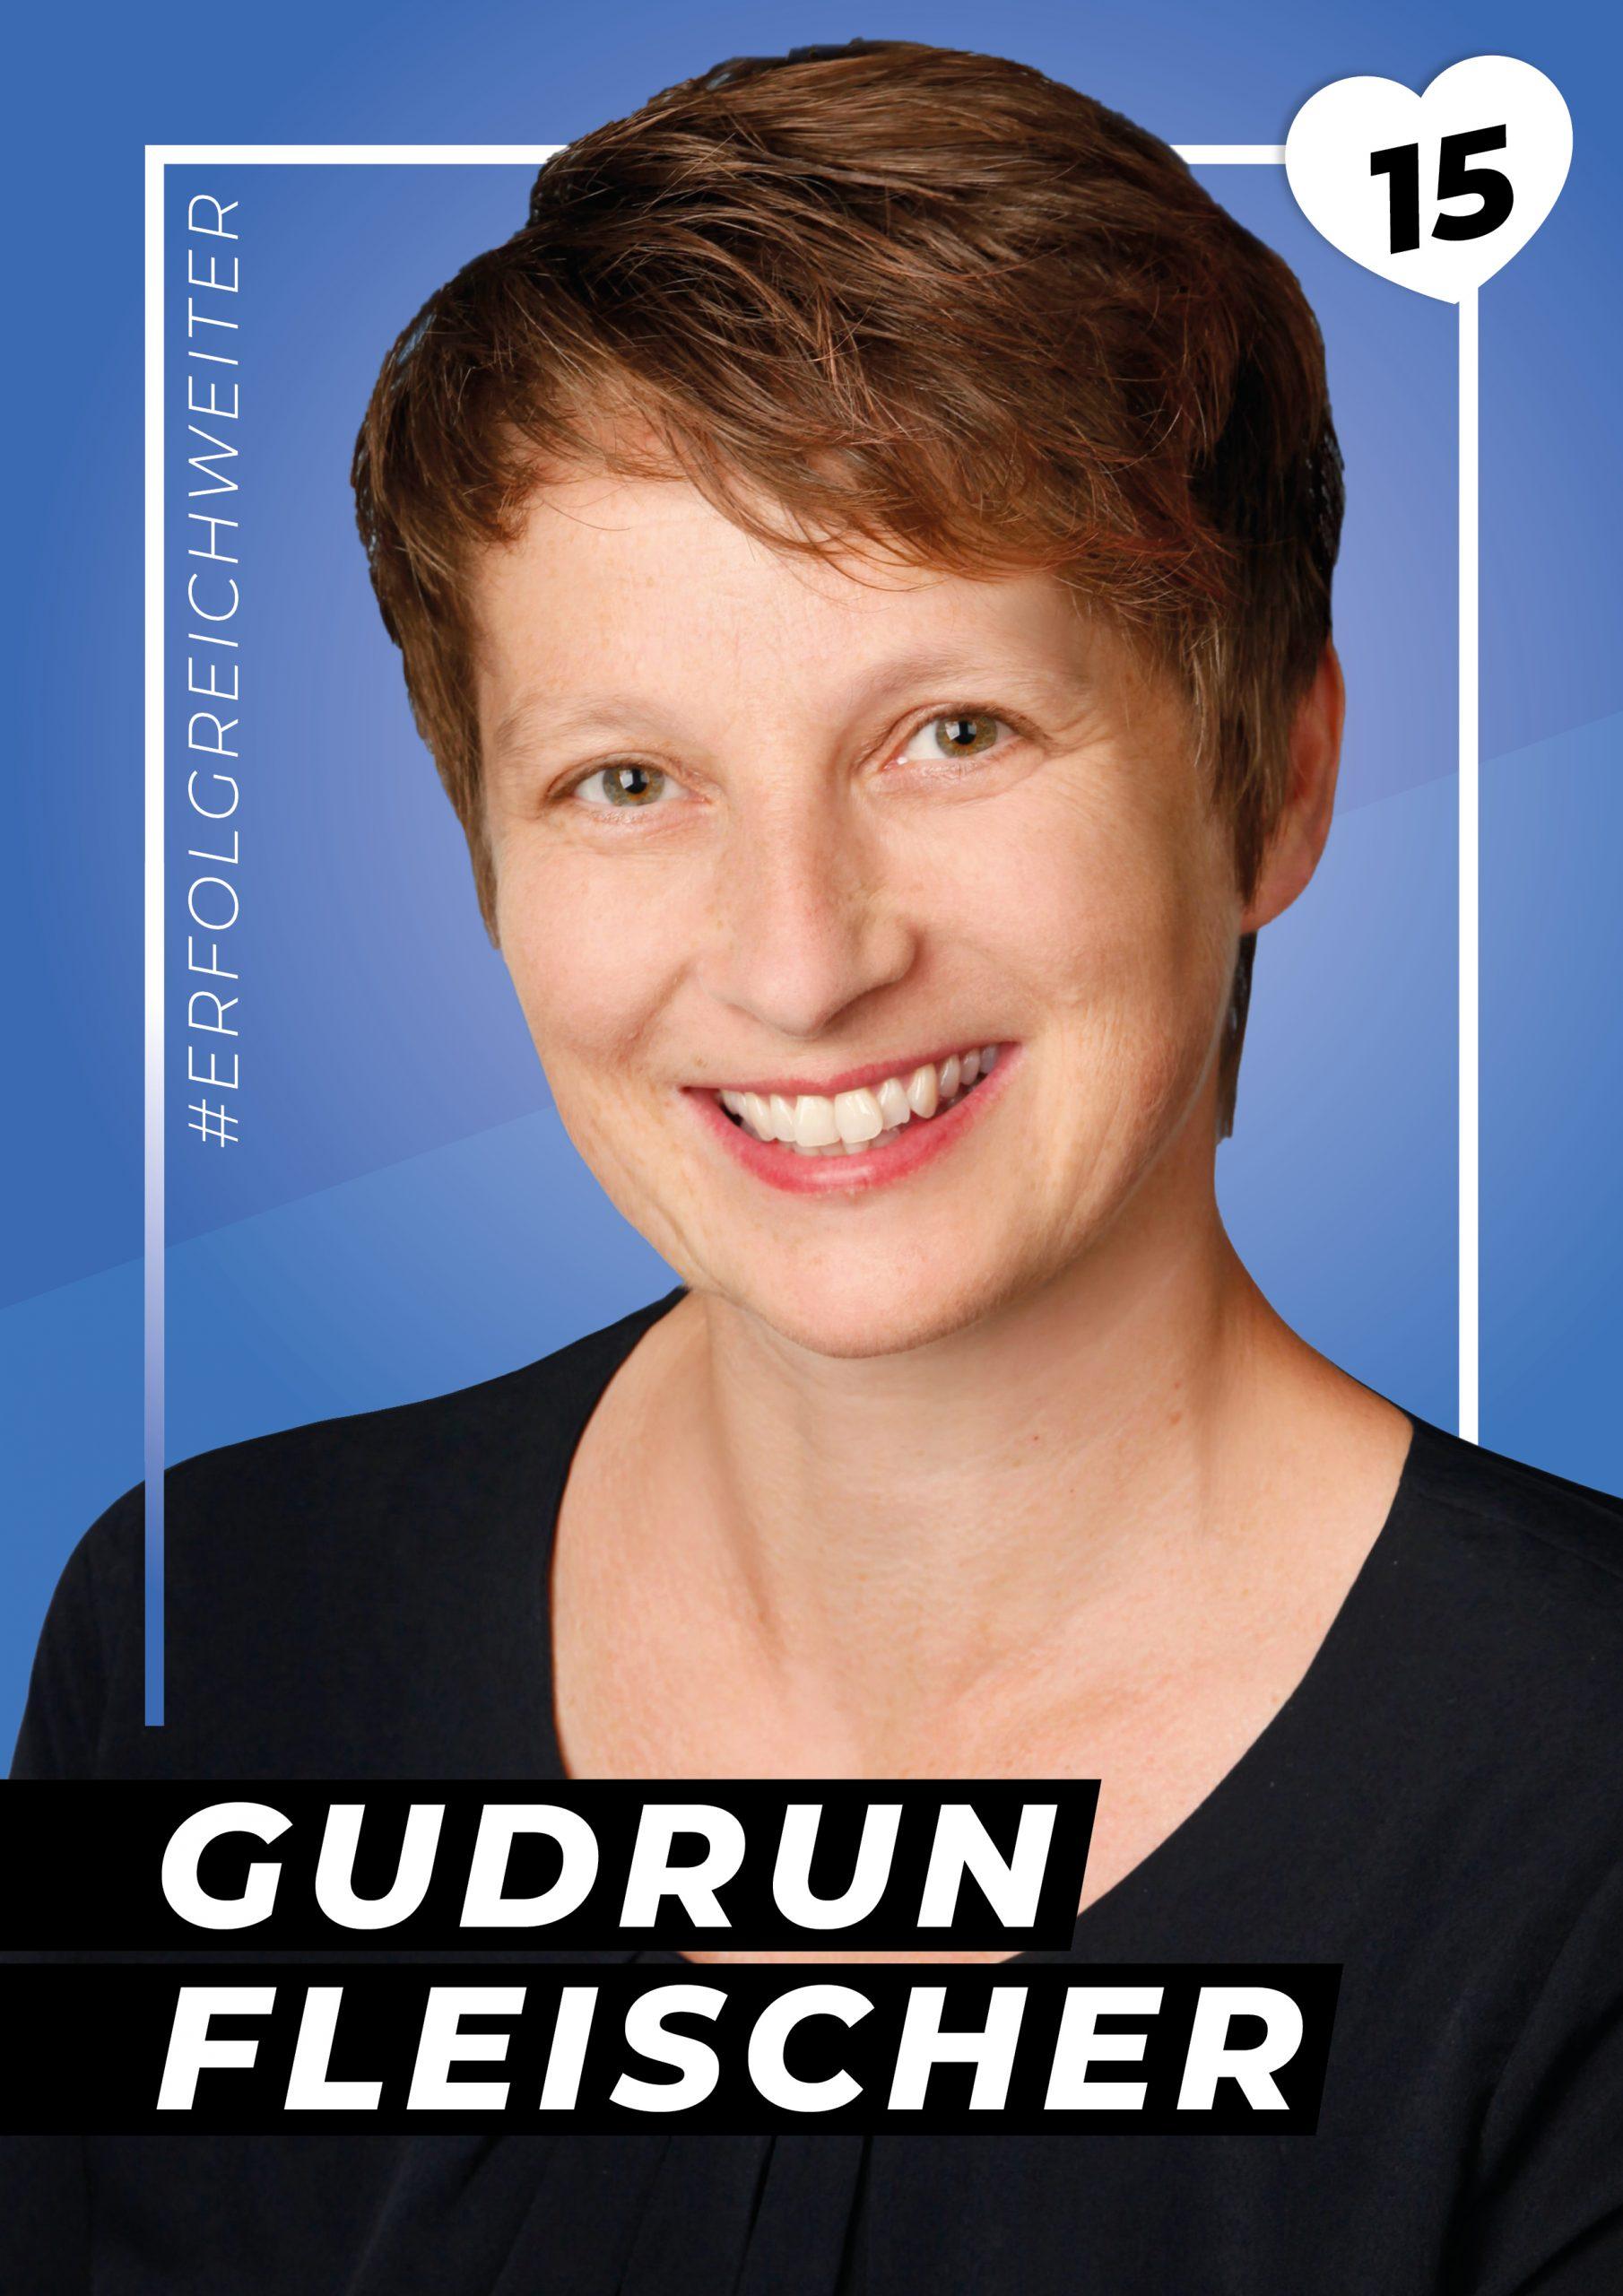 2019 Bürgerliste Köfering_Kandidaten15